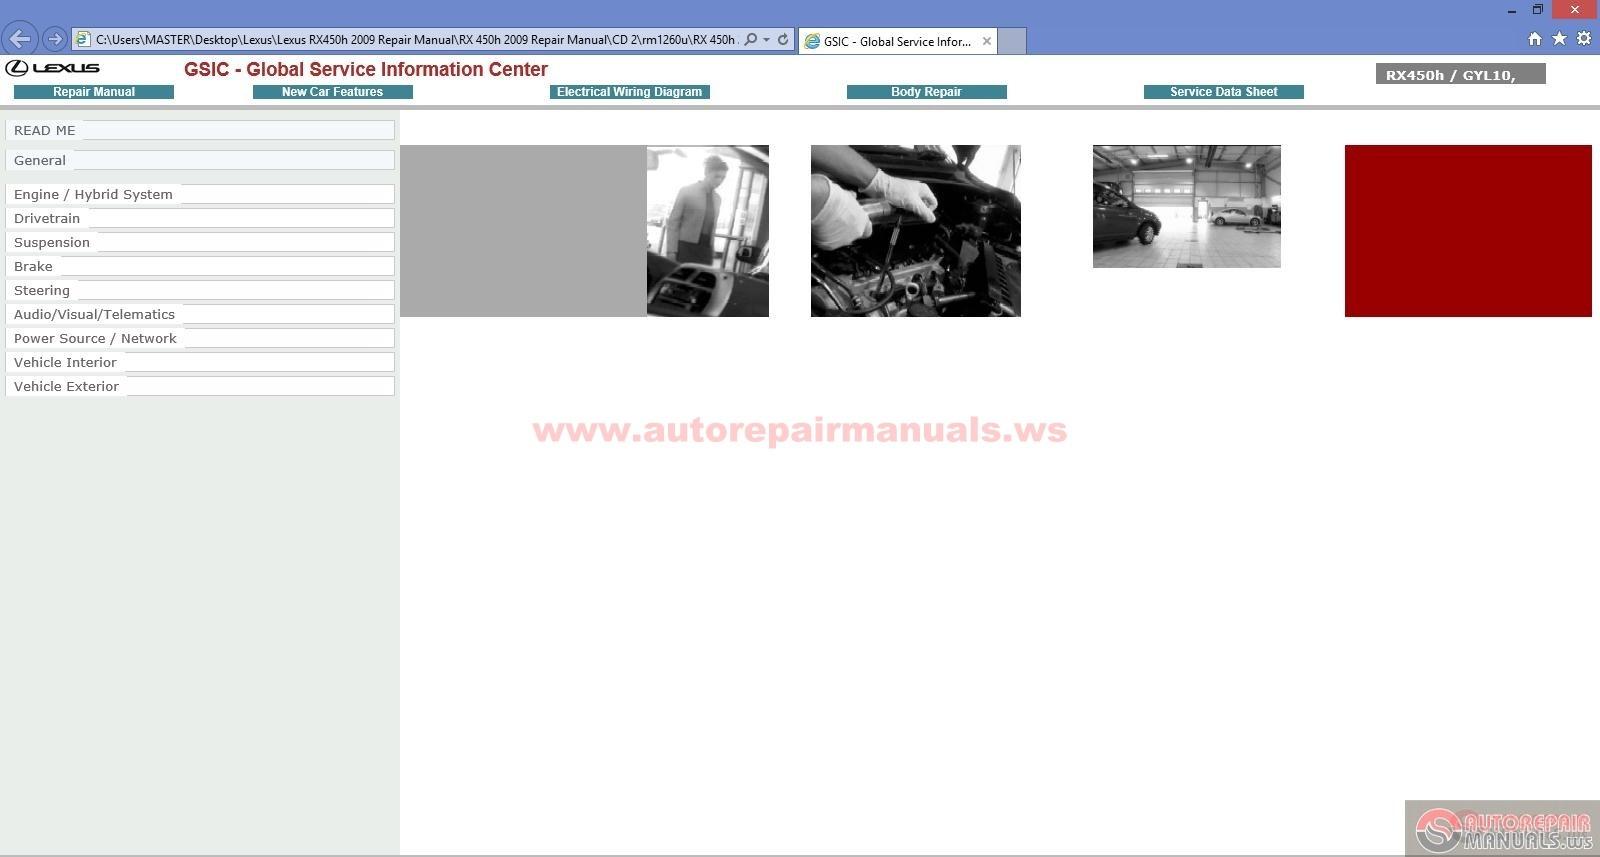 Lexus Ls 460 Workshop Manual Good Owner Guide Website Wiring Diagram Rx450h 2009 Repair Auto Forum Service 2007